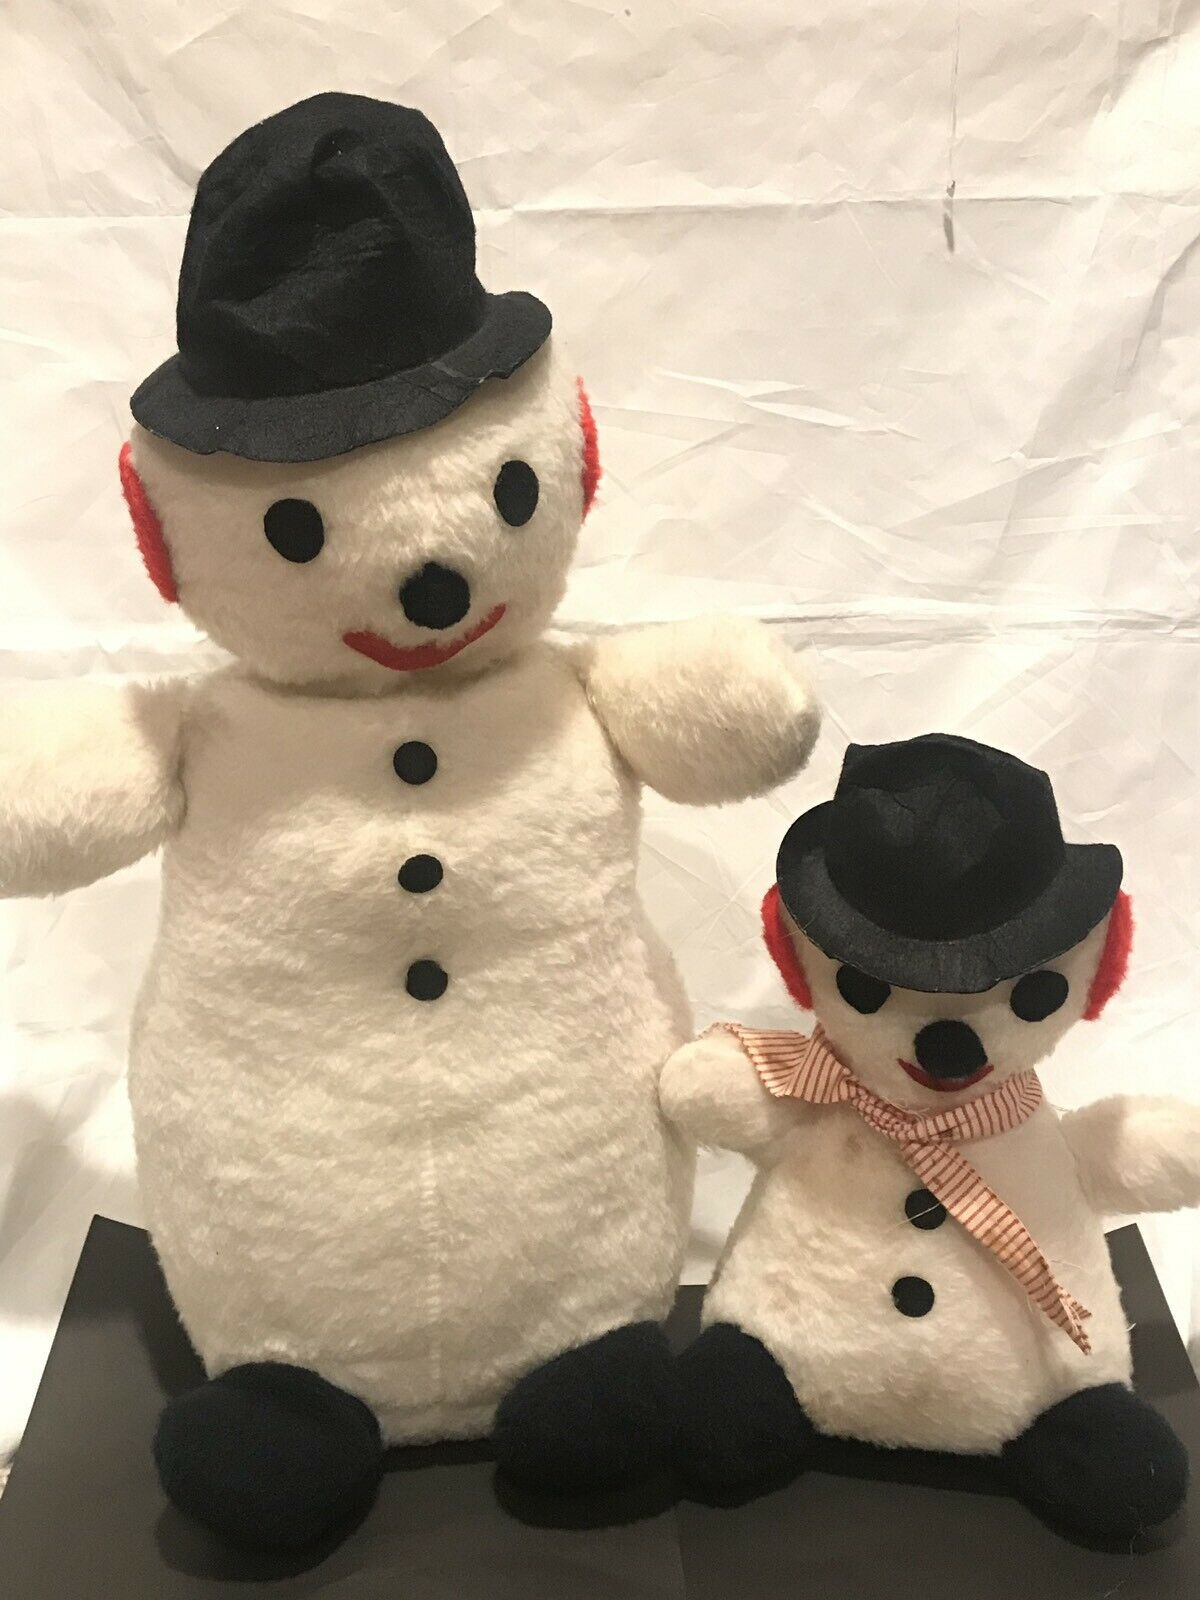 "Vtg Vtg Vtg Parisi Creations Plush Snowman Pair 24"" 14"" 05f6ac"